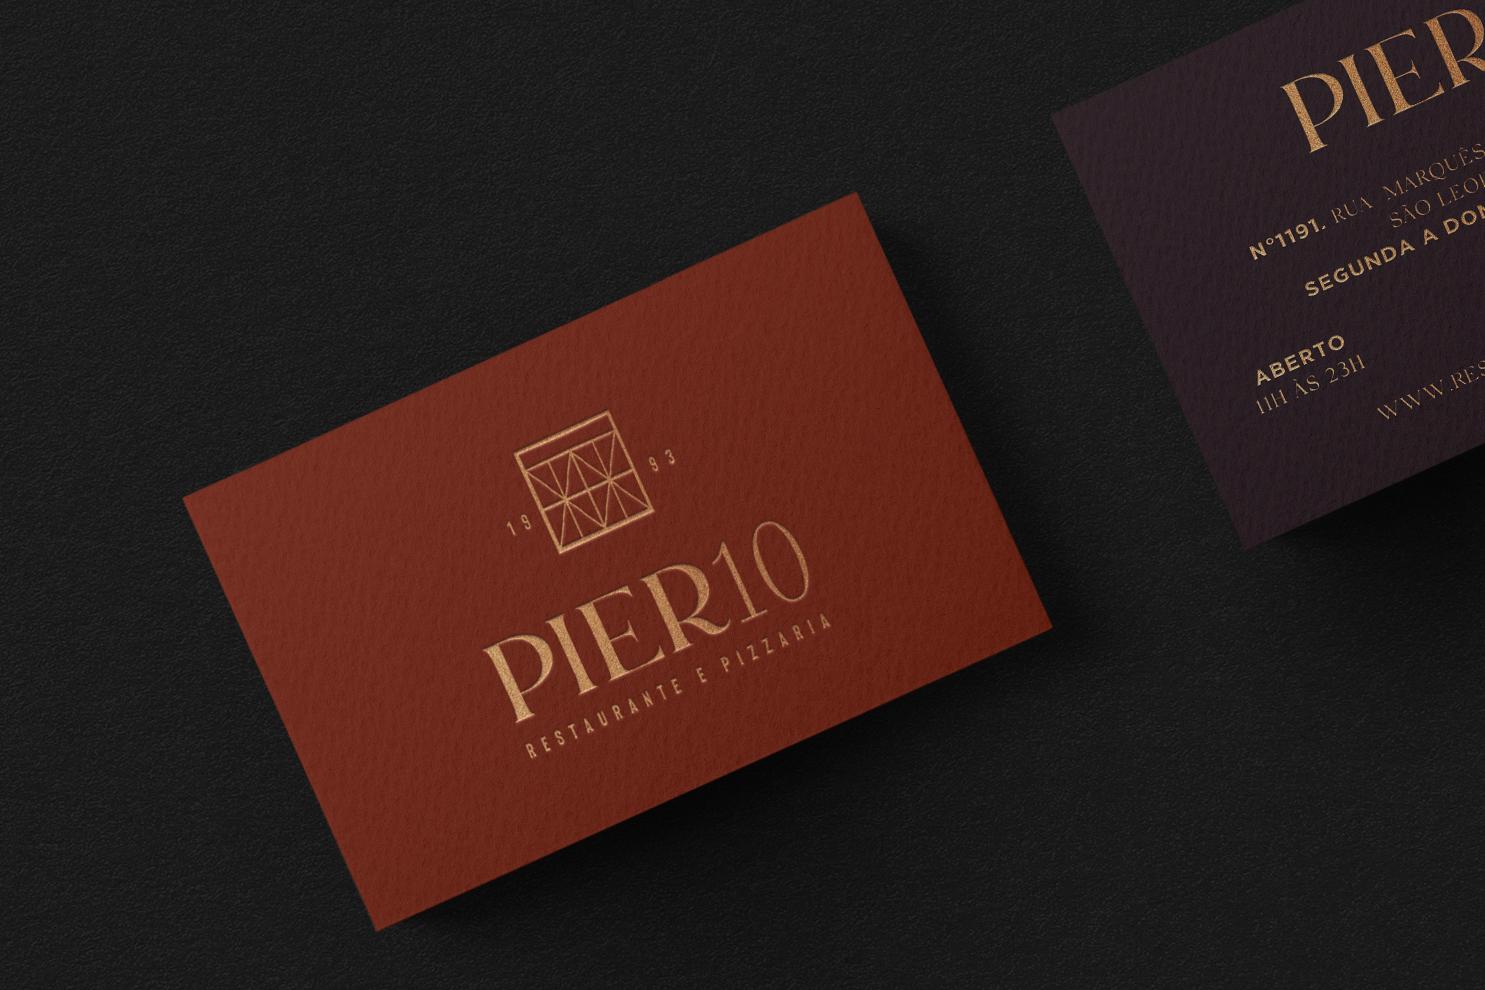 Identidade Visual Pier10 - Pier10